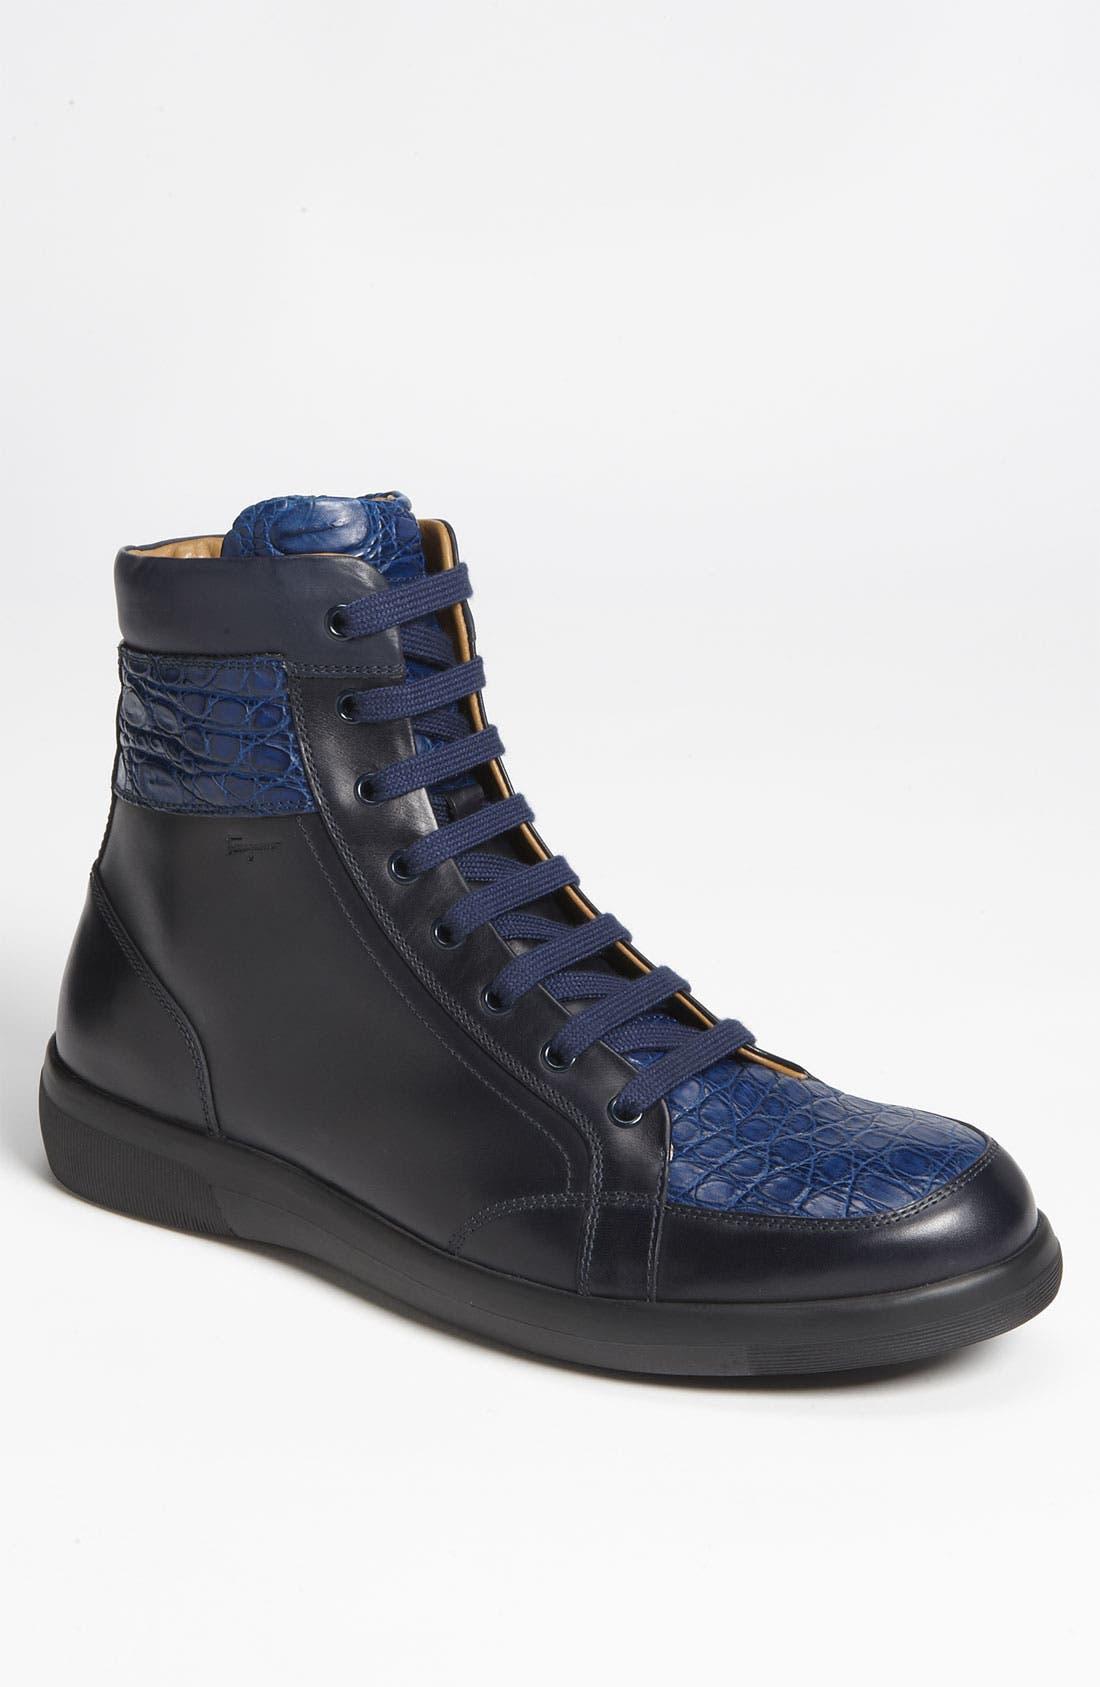 Main Image - Salvatore Ferragamo 'Austria 2' Hi-Top Sneaker